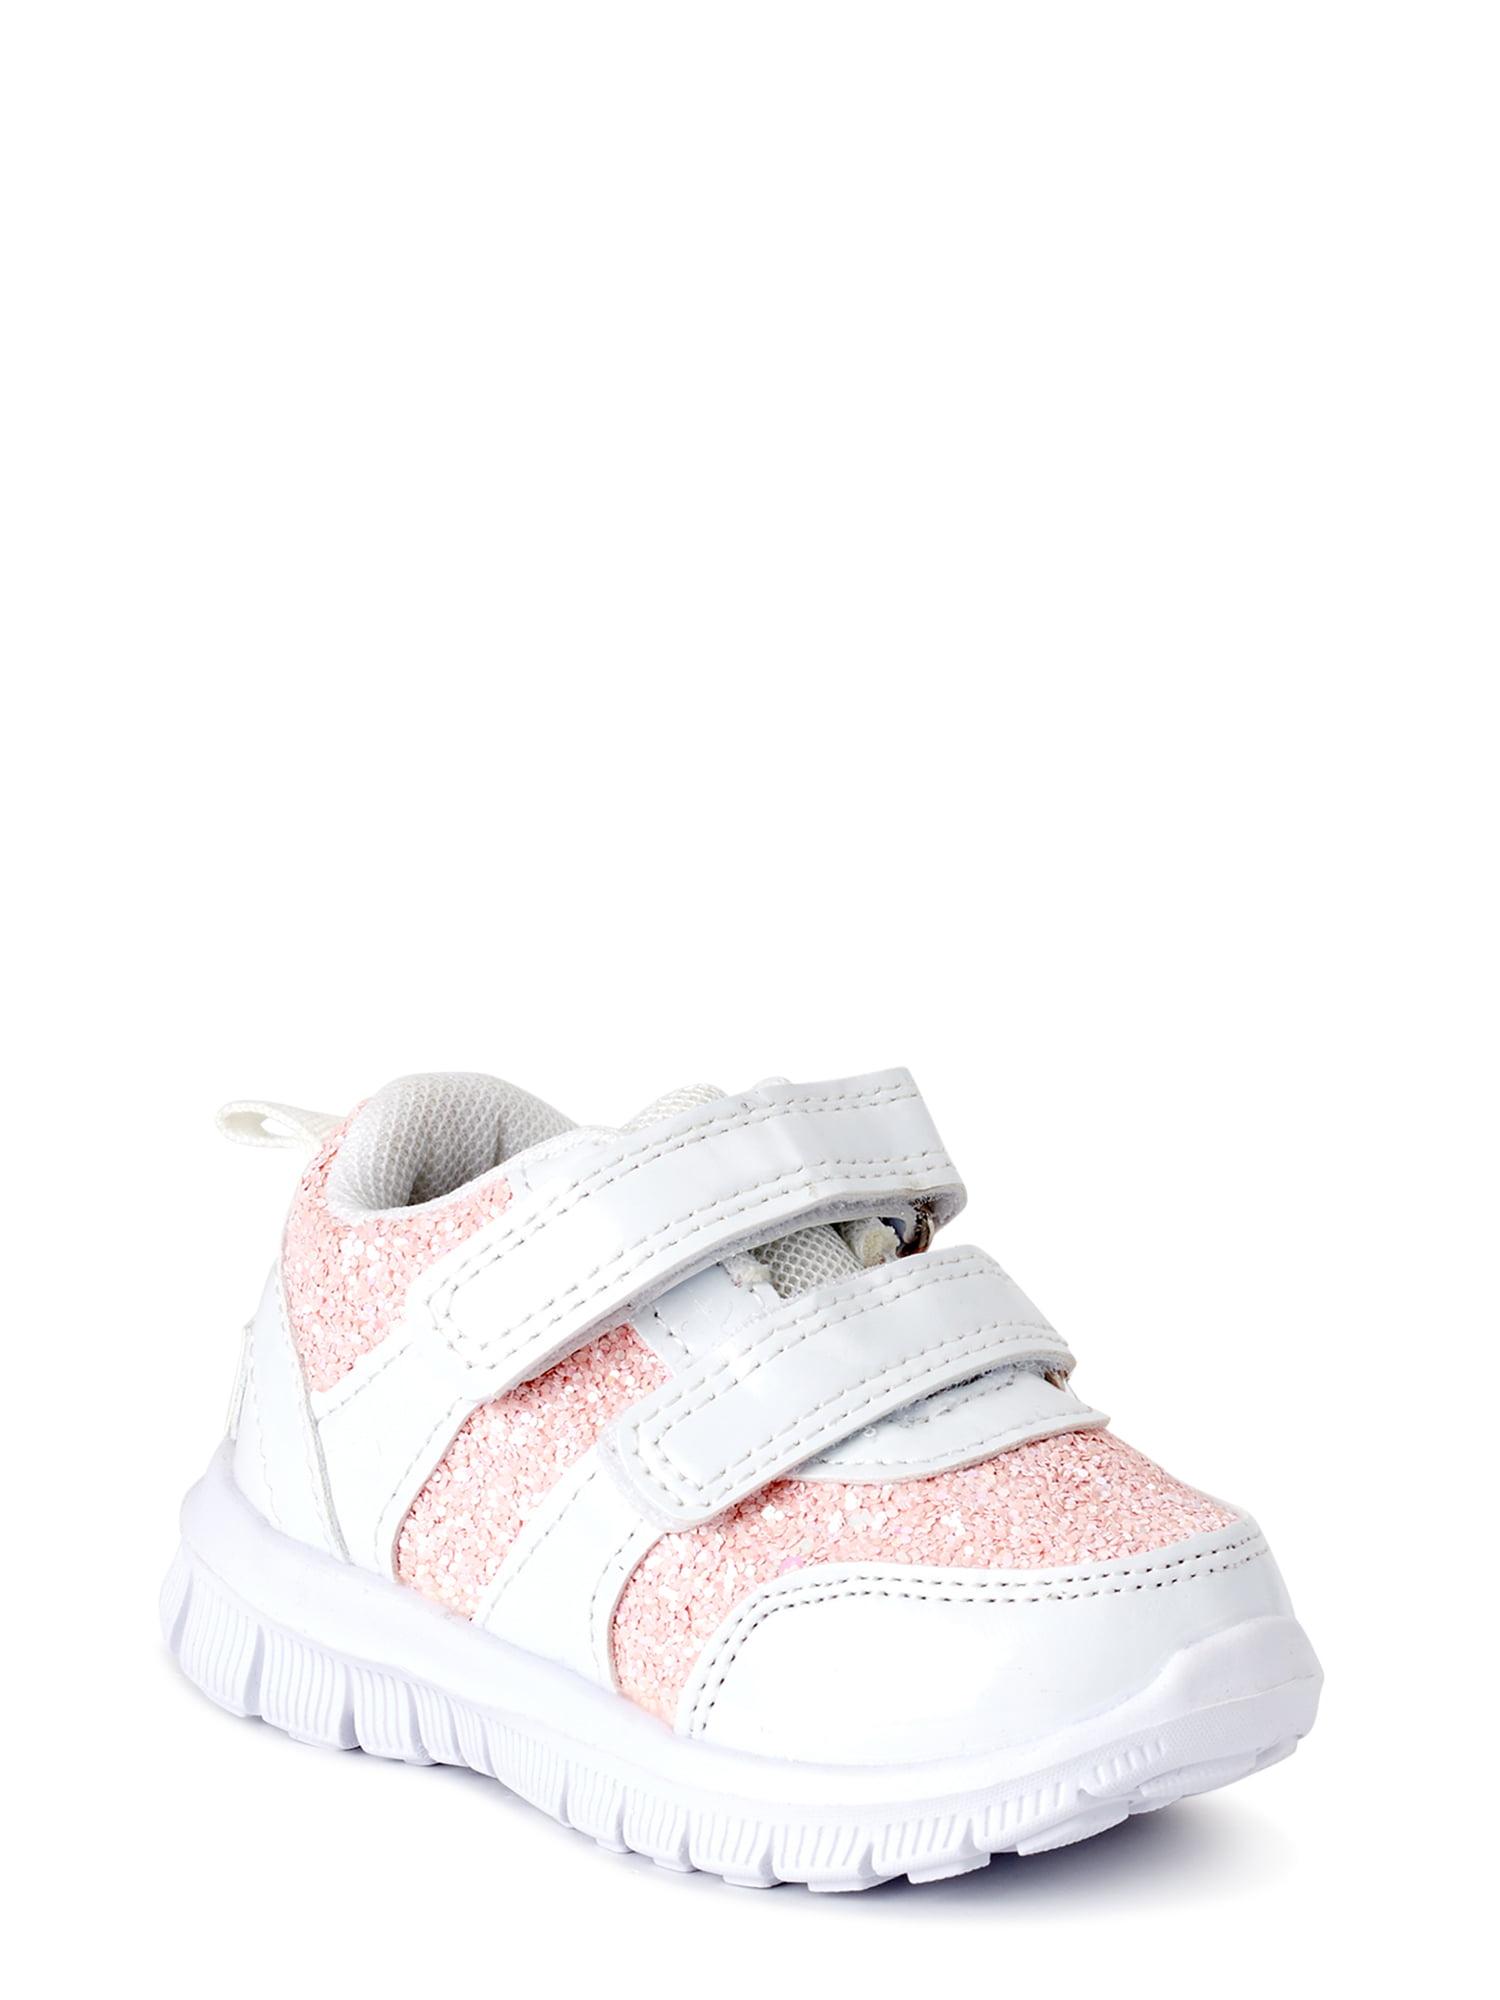 White Baby Girl Shoes - Walmart.com